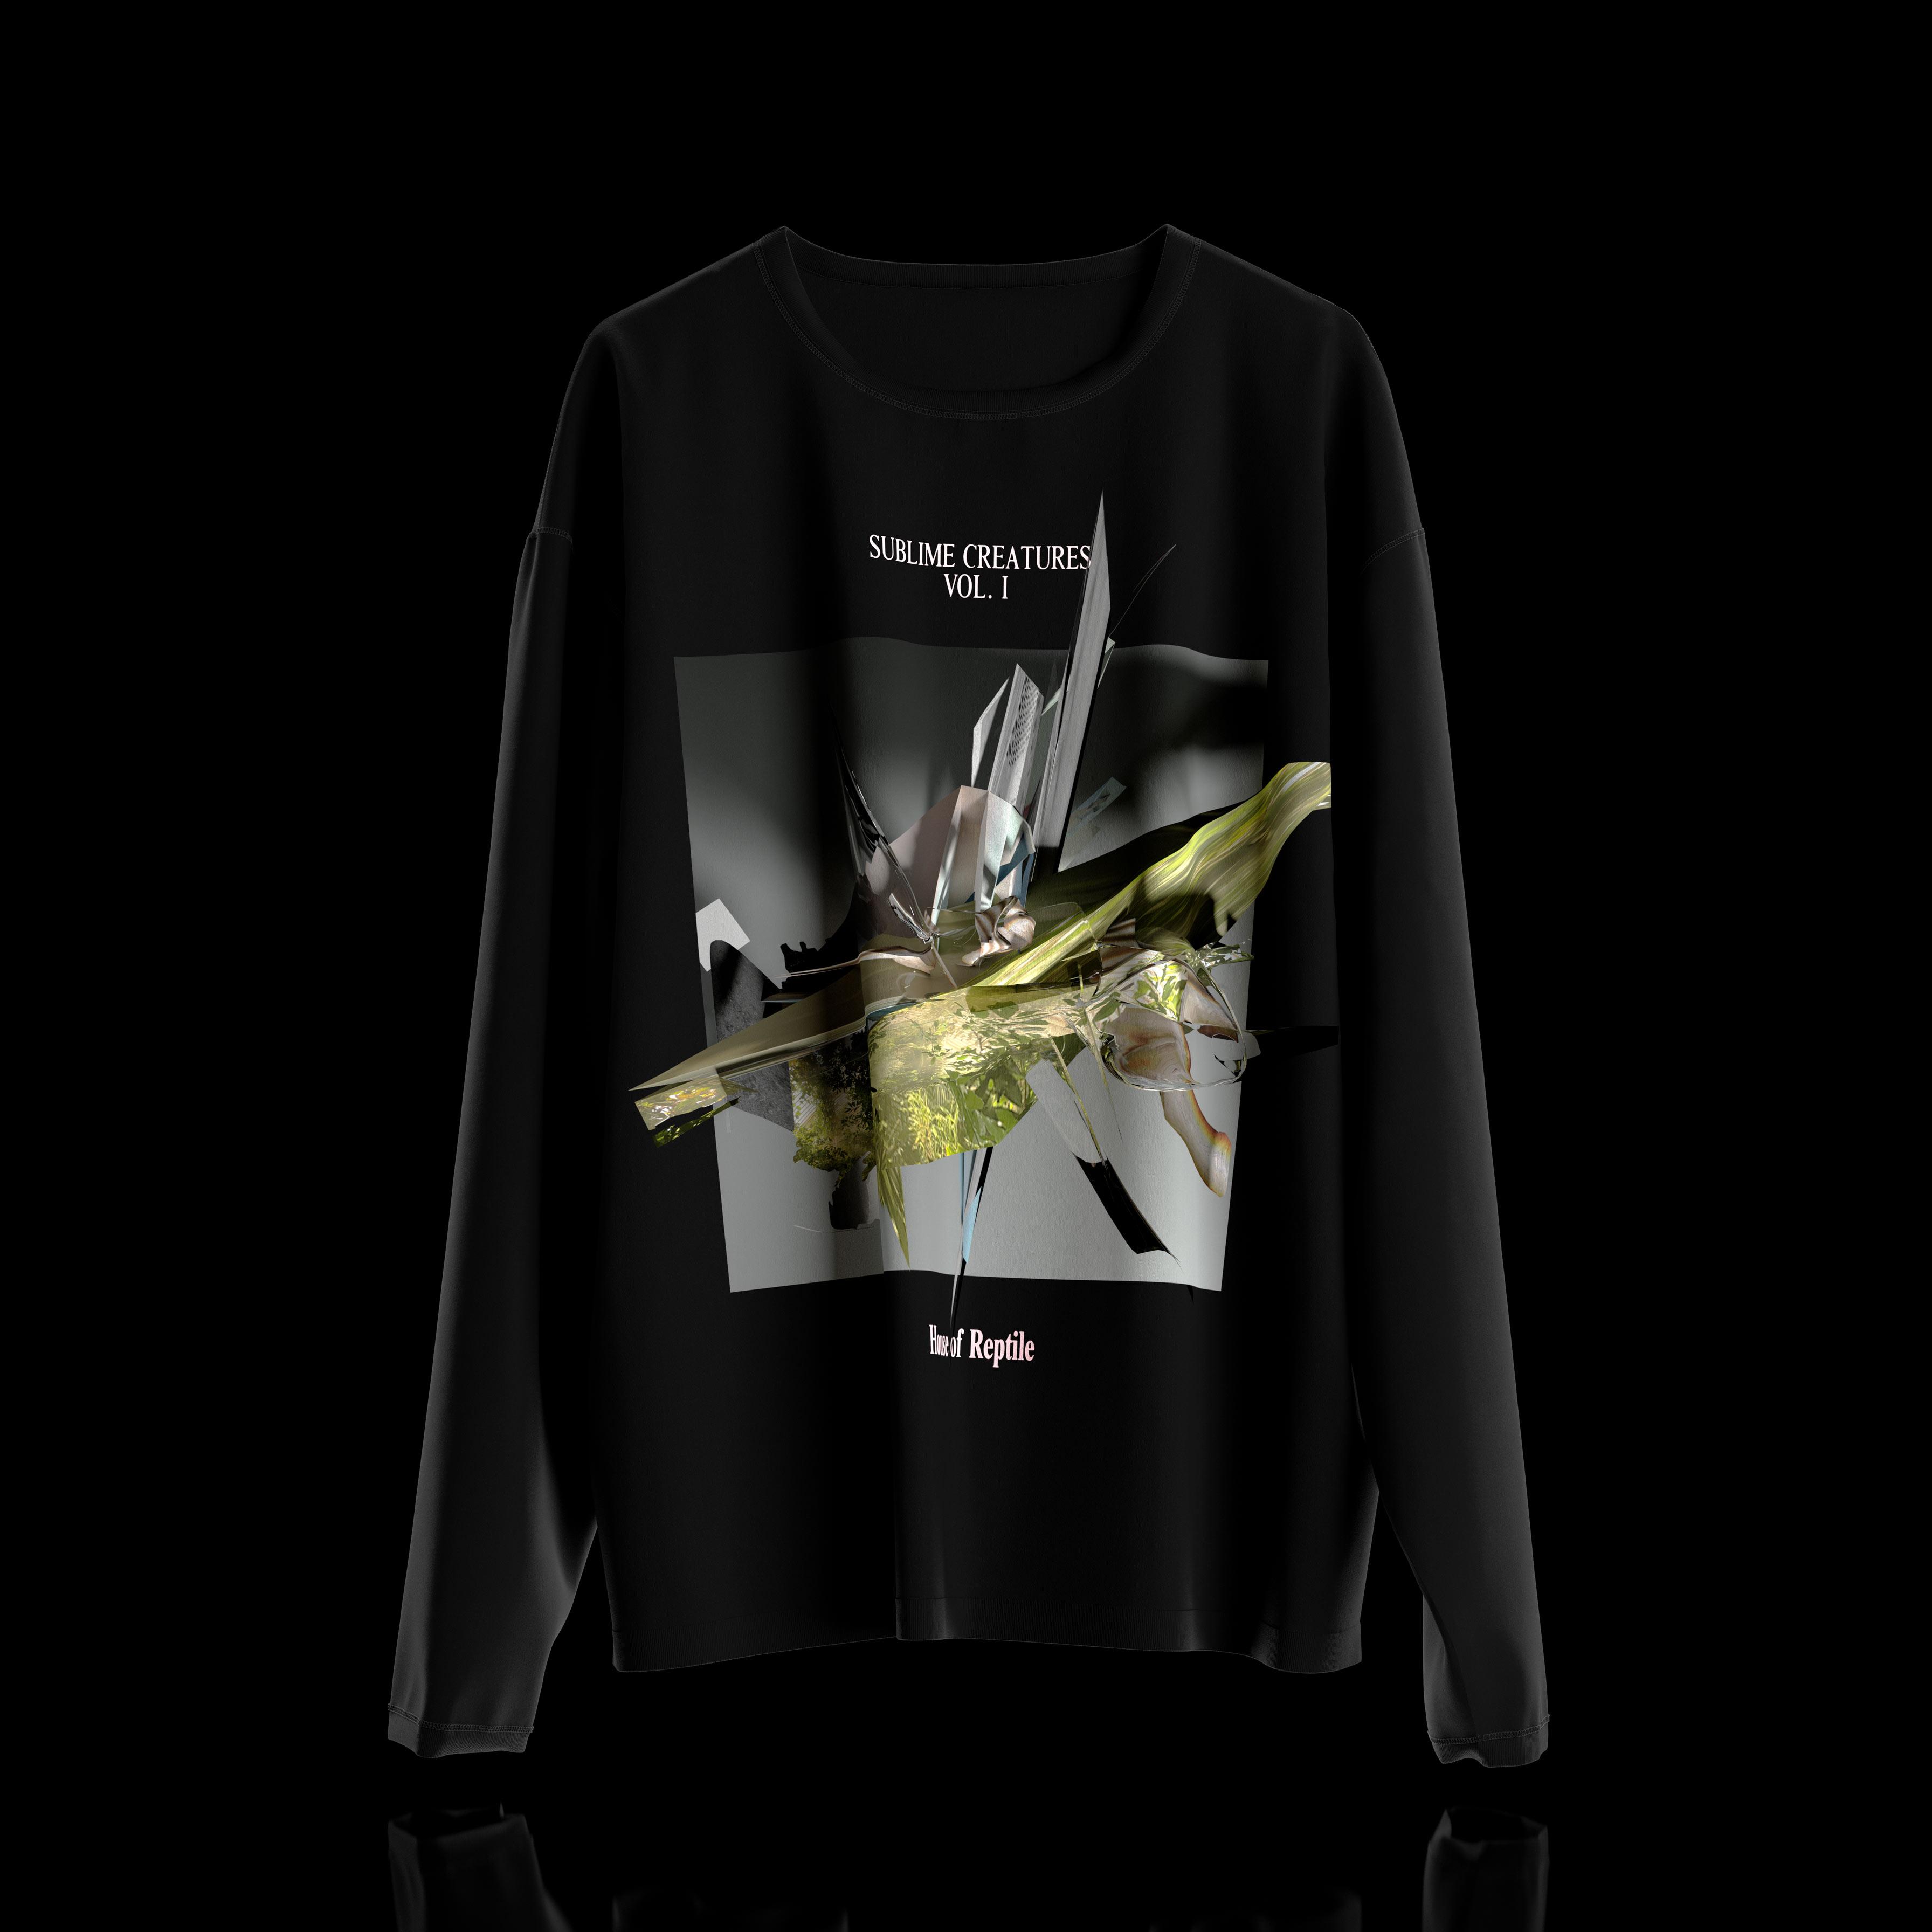 House of Reptile - Sublime Creators - Shirt